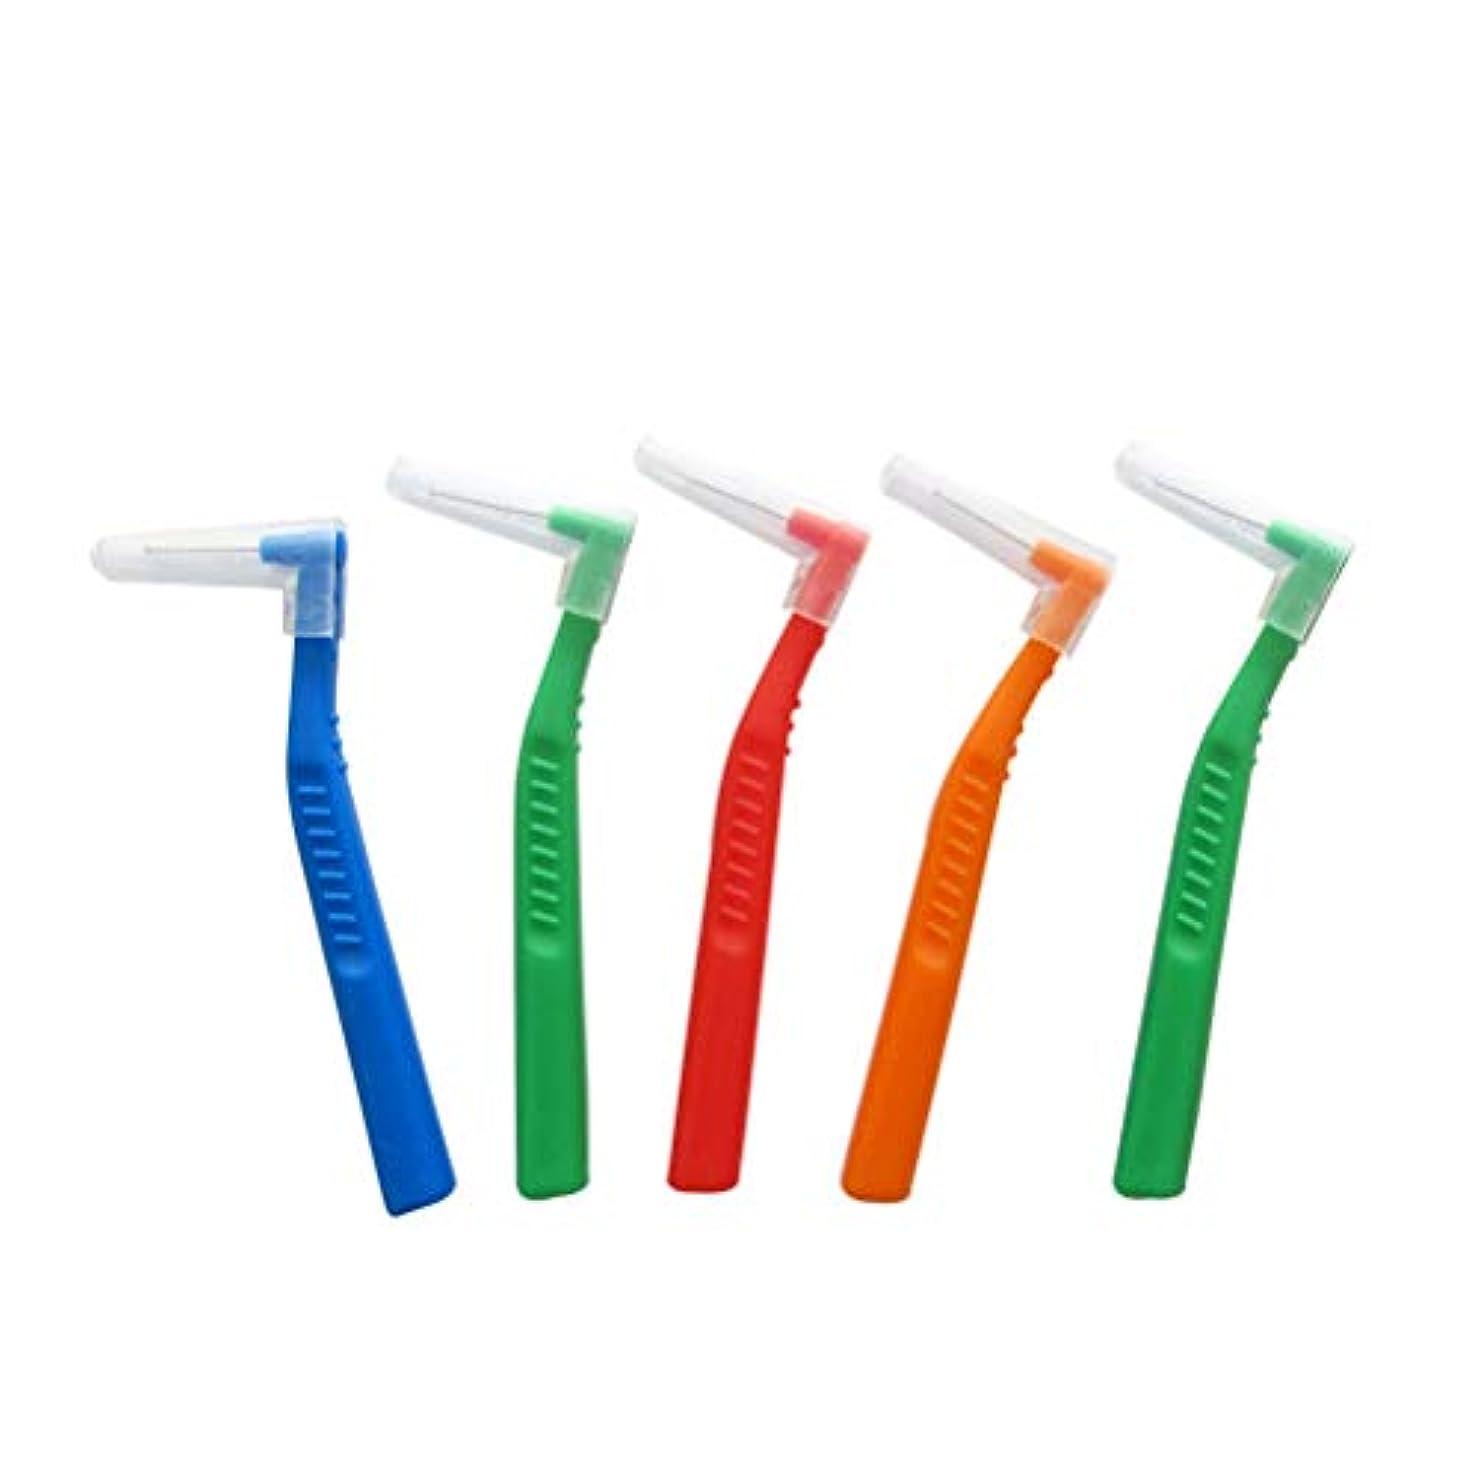 SUPVOX 歯間ブラシ クリーナー l字型 歯間清掃 歯科 口腔ケアツール 5本入(ランダムカラー)